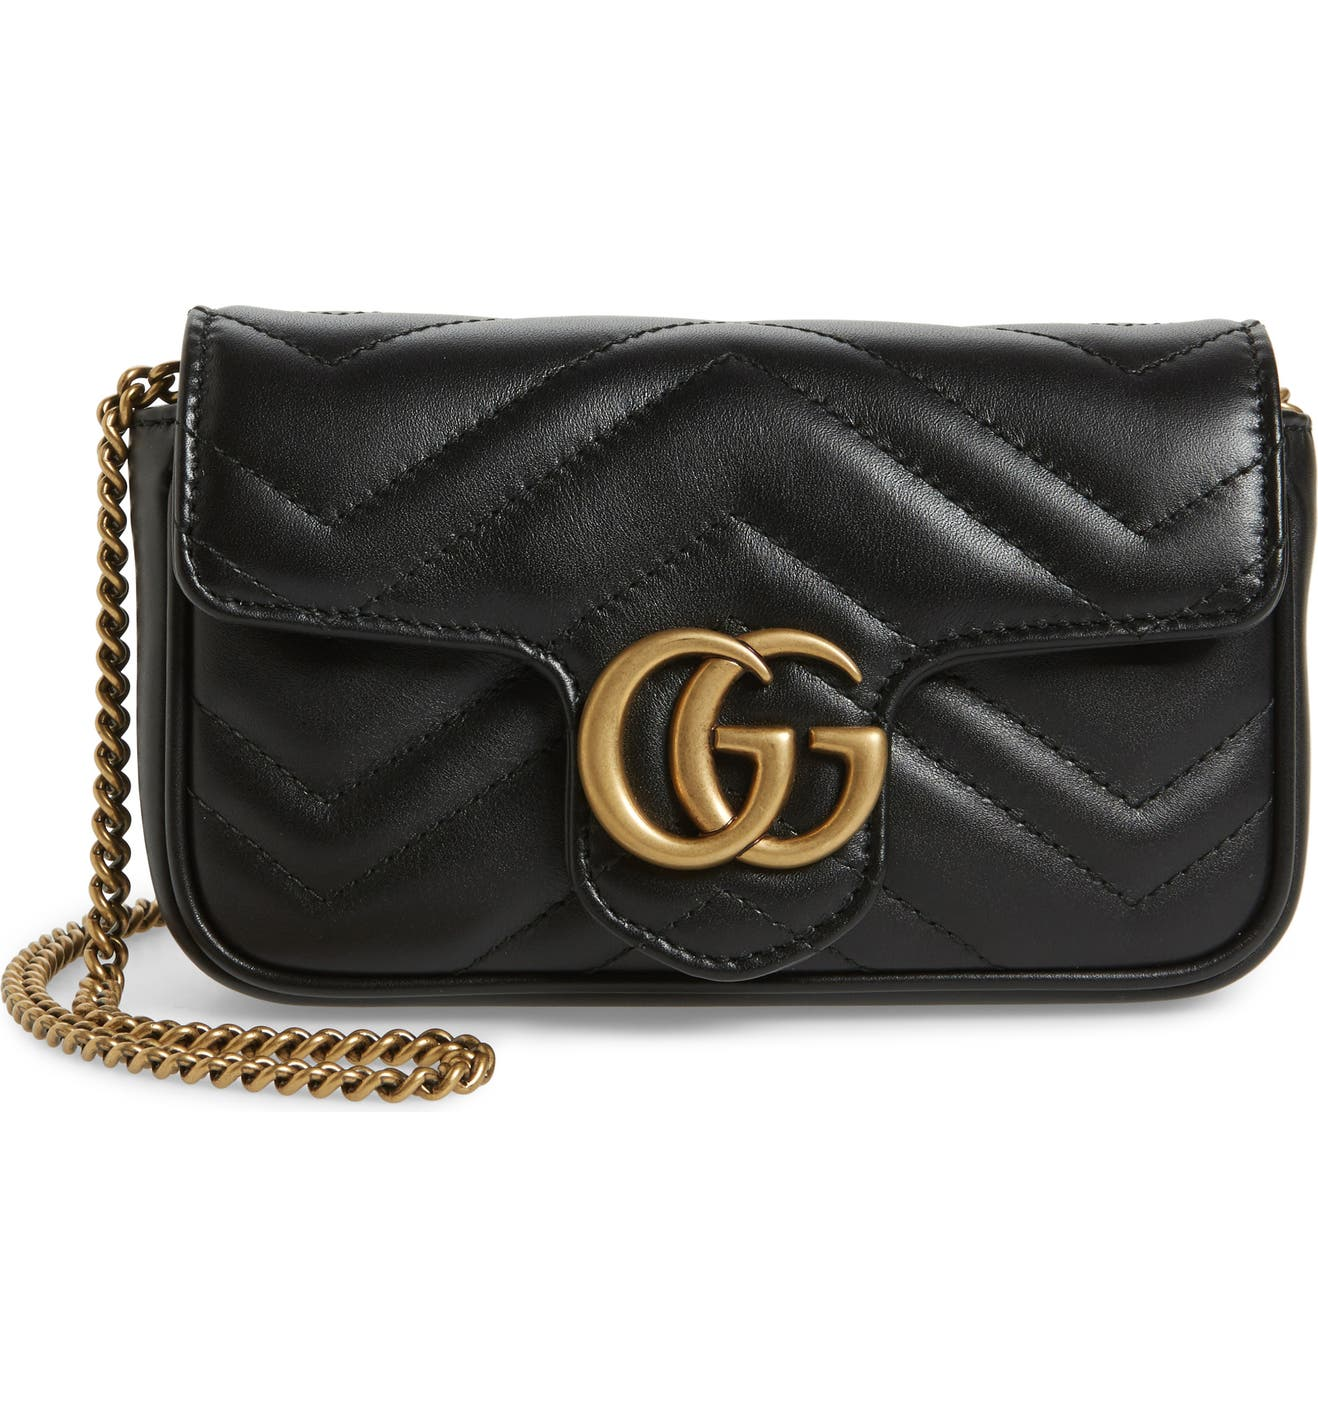 7b5e9e1a7 Gucci Supermini GG Marmont 2.0 Matelassé Leather Shoulder Bag | Nordstrom